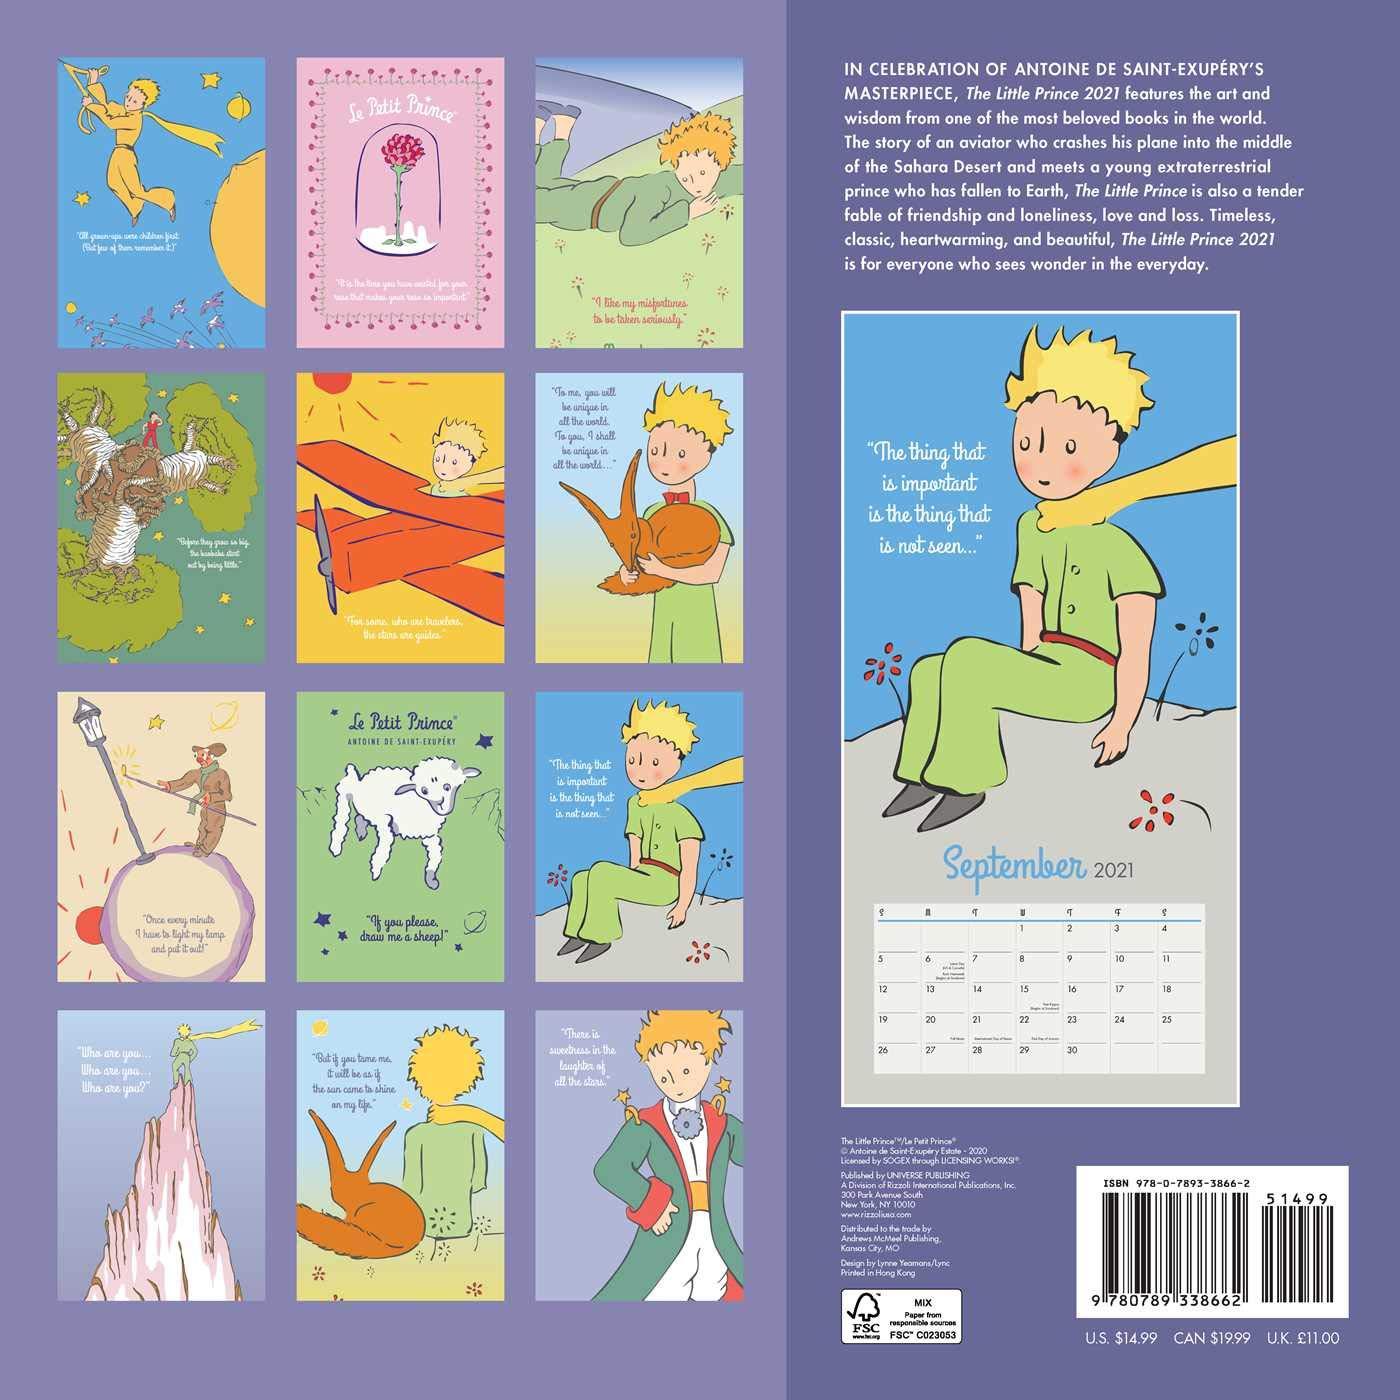 The Little Prince 2021 Wall Calendar: Antoine de Saint Exupery